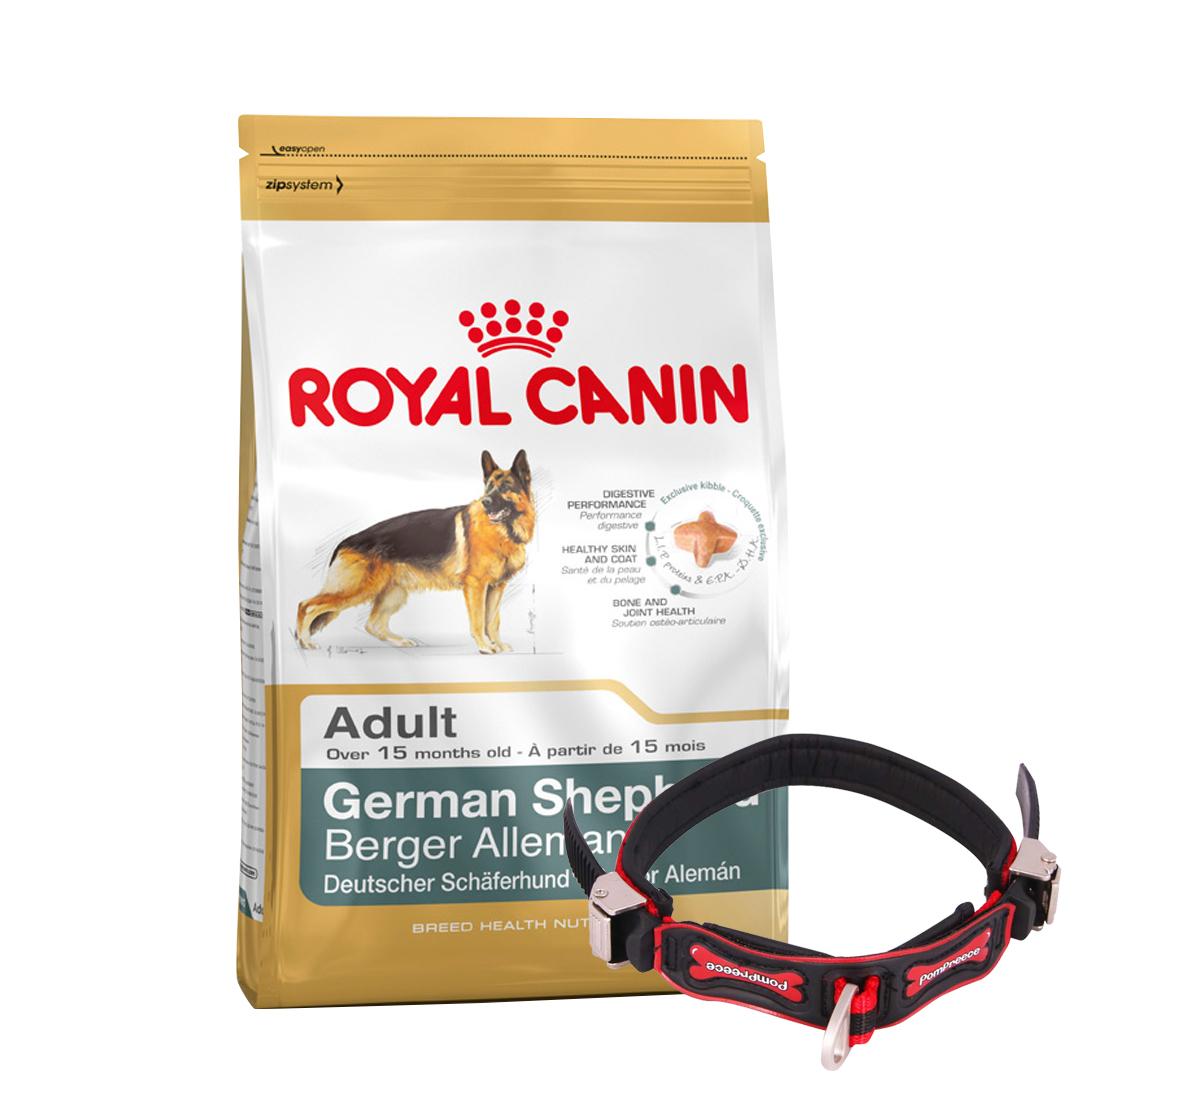 Royal Canin German Shepherd Adult - 3 Kg With Ergocomfort Dog Collar Large-Red